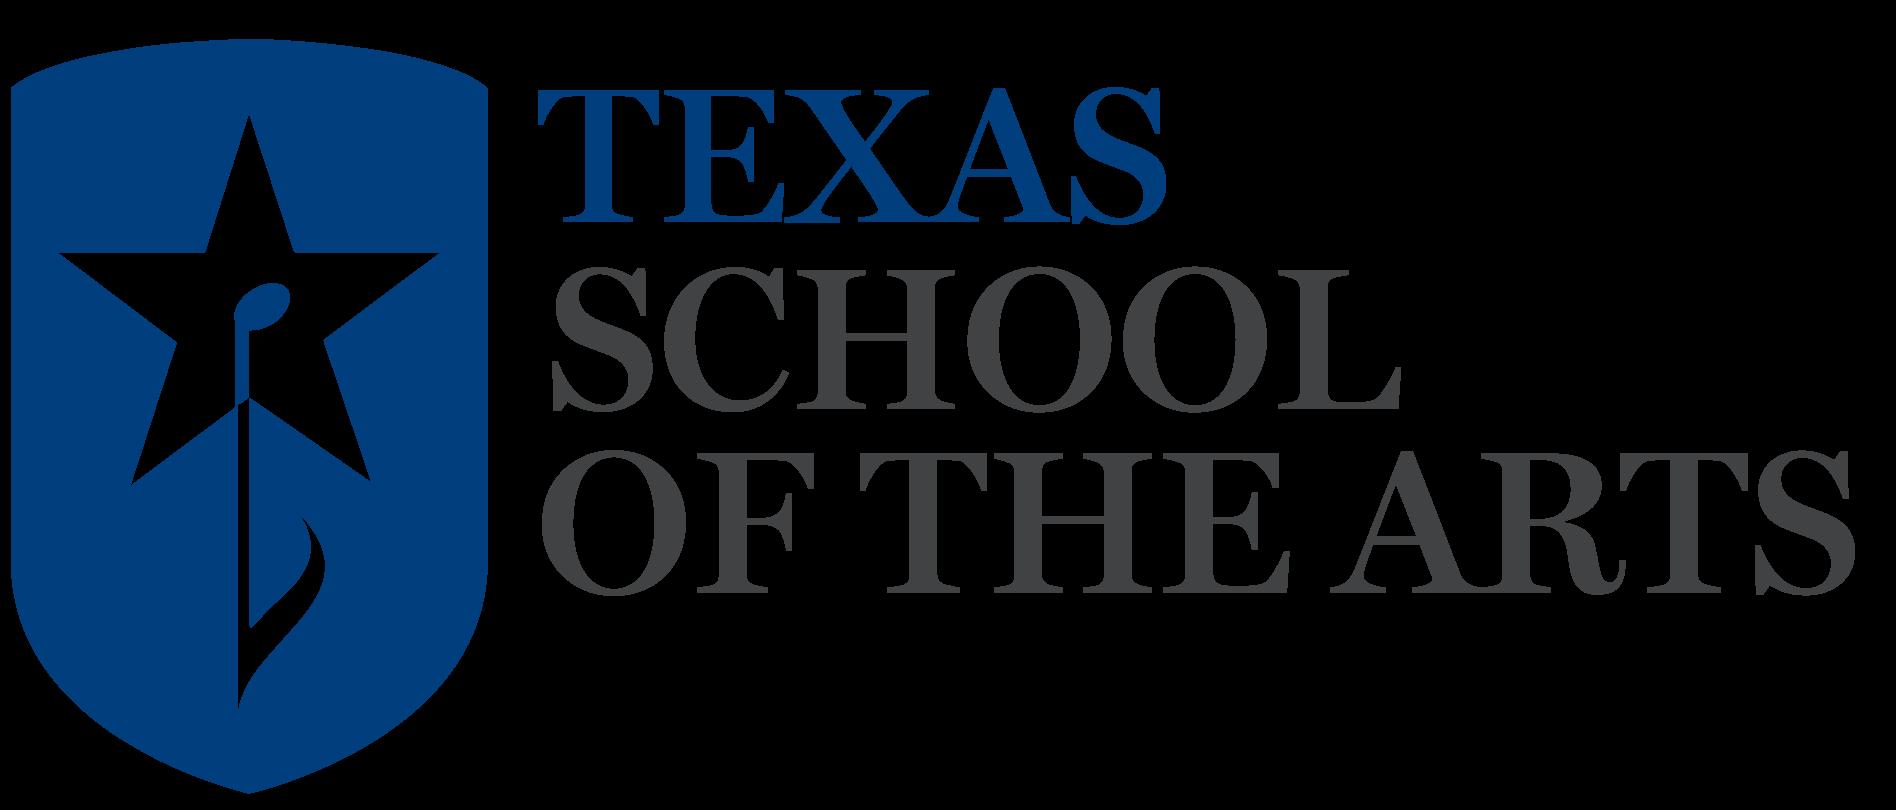 Texas School of the Arts